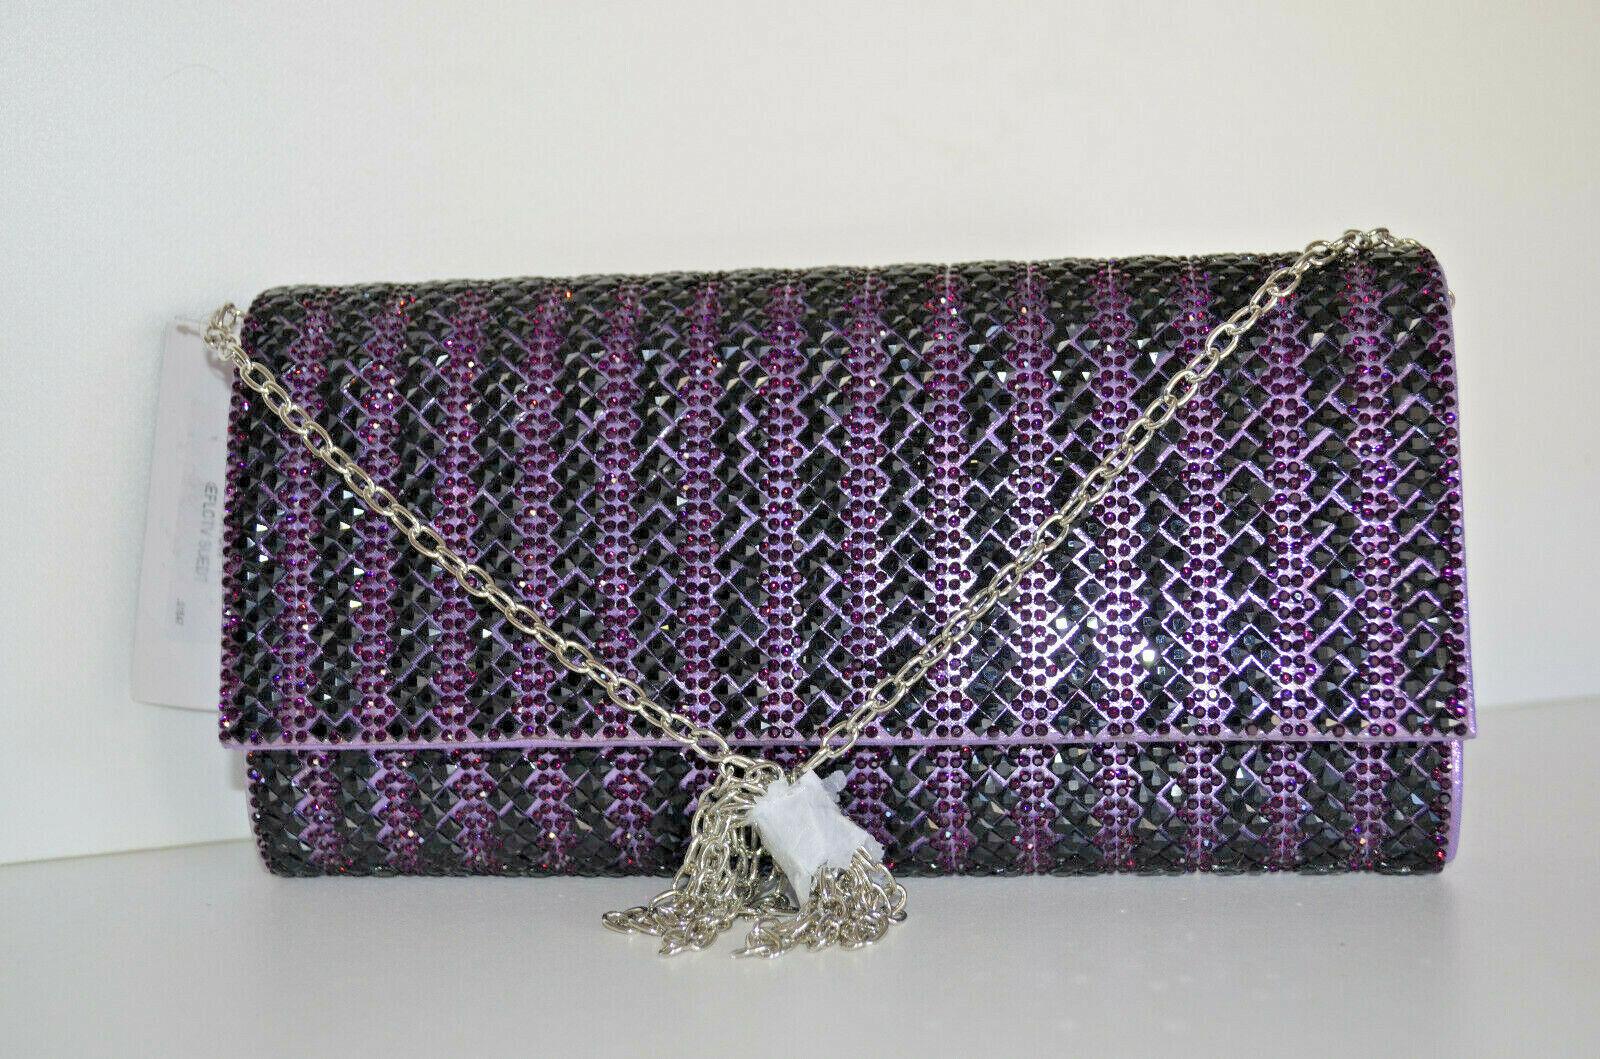 NEW NINA New York women's clutch bag, NO BOX